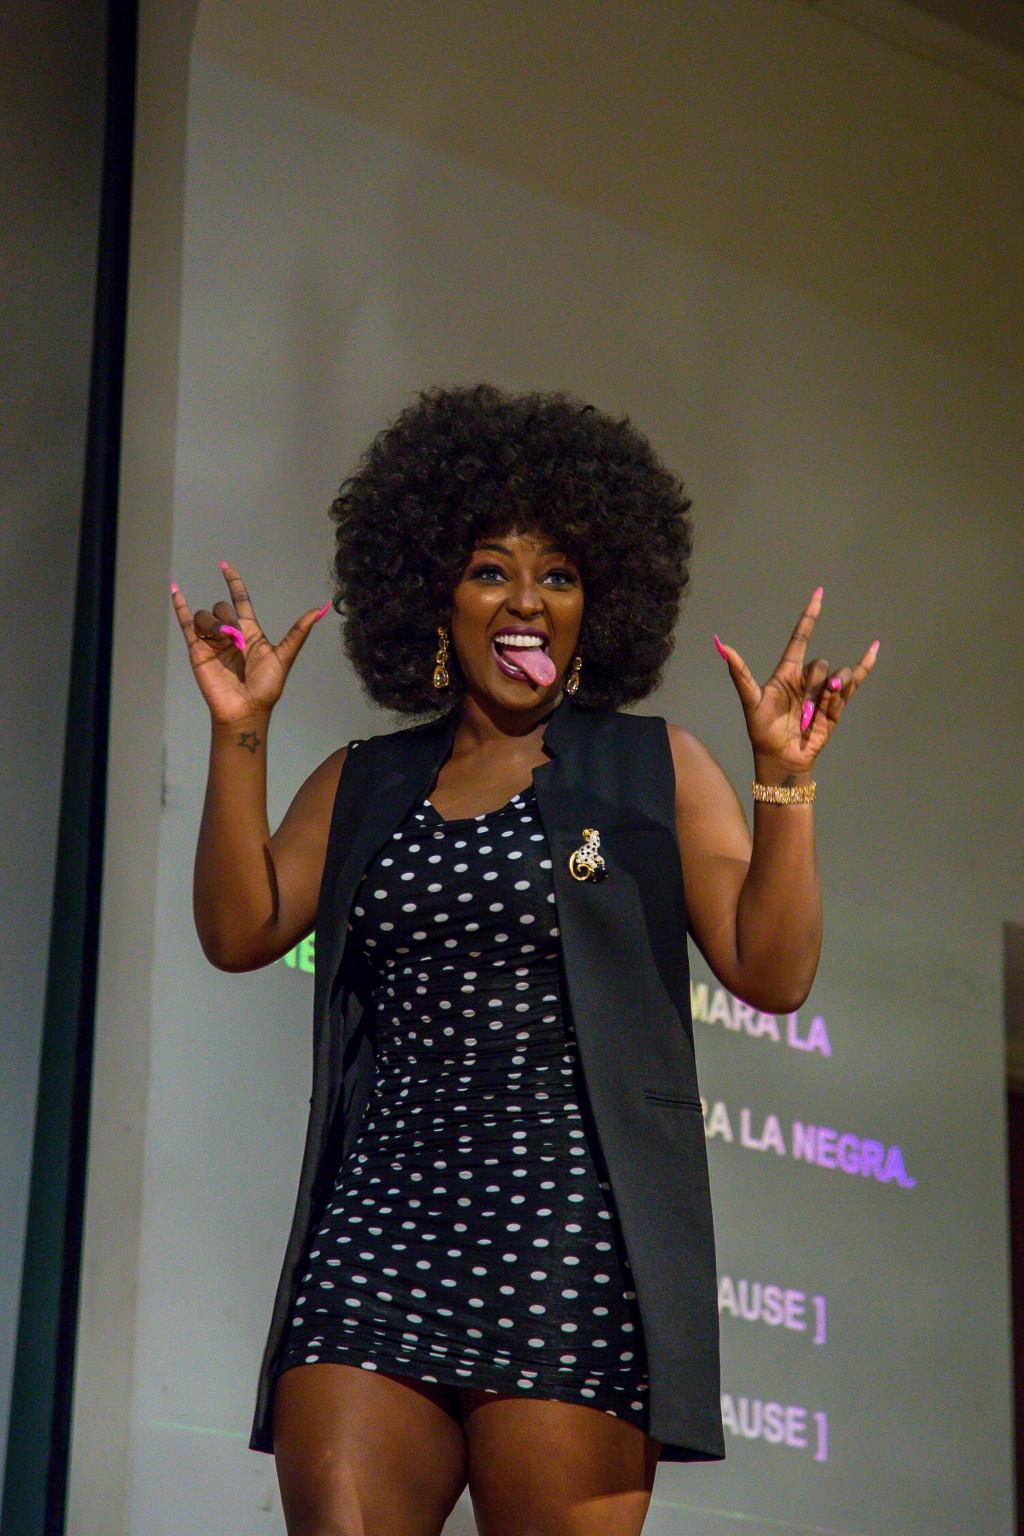 La Negra Shaped By Family Sacrifice Discipline The Oracle